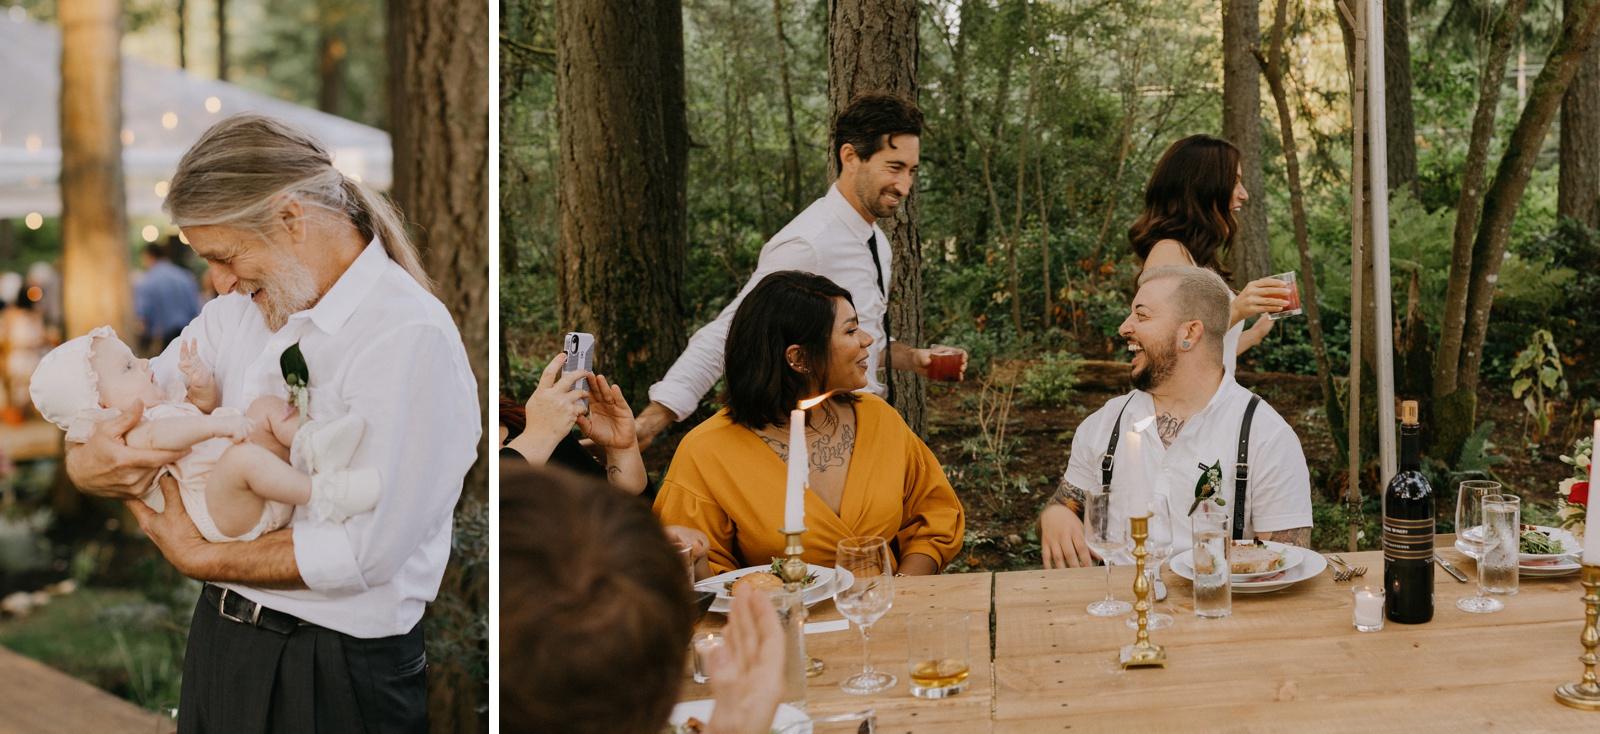 Matthew and Autumn Intimate Outdoor Backyard Wedding_0184